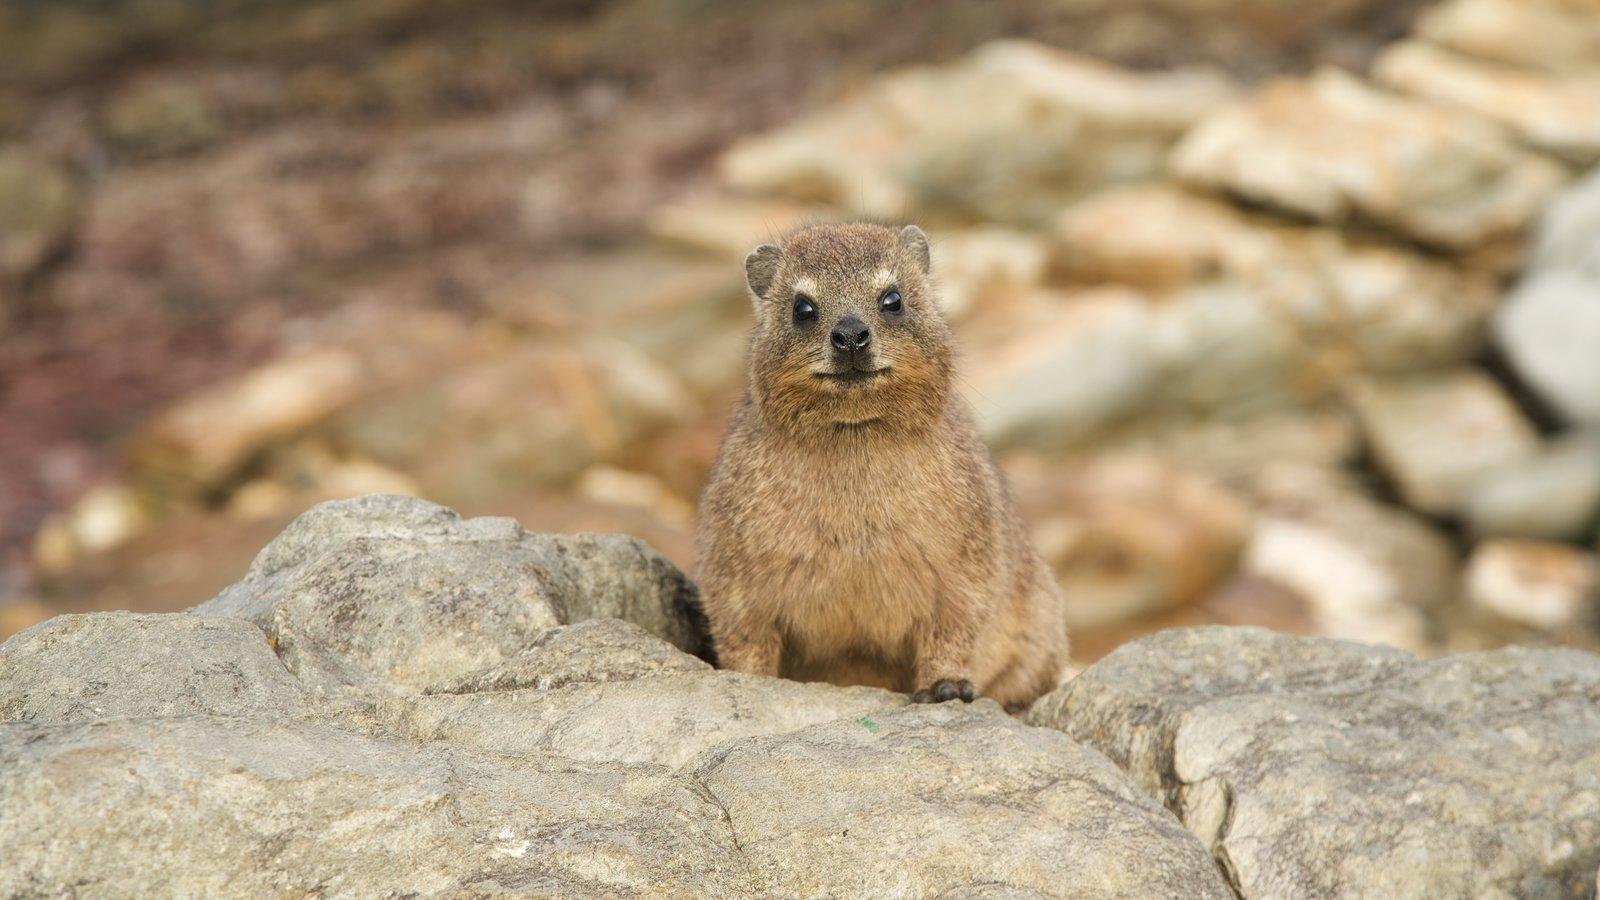 Tsitsikamma National Park featuring cuddly or friendly animals